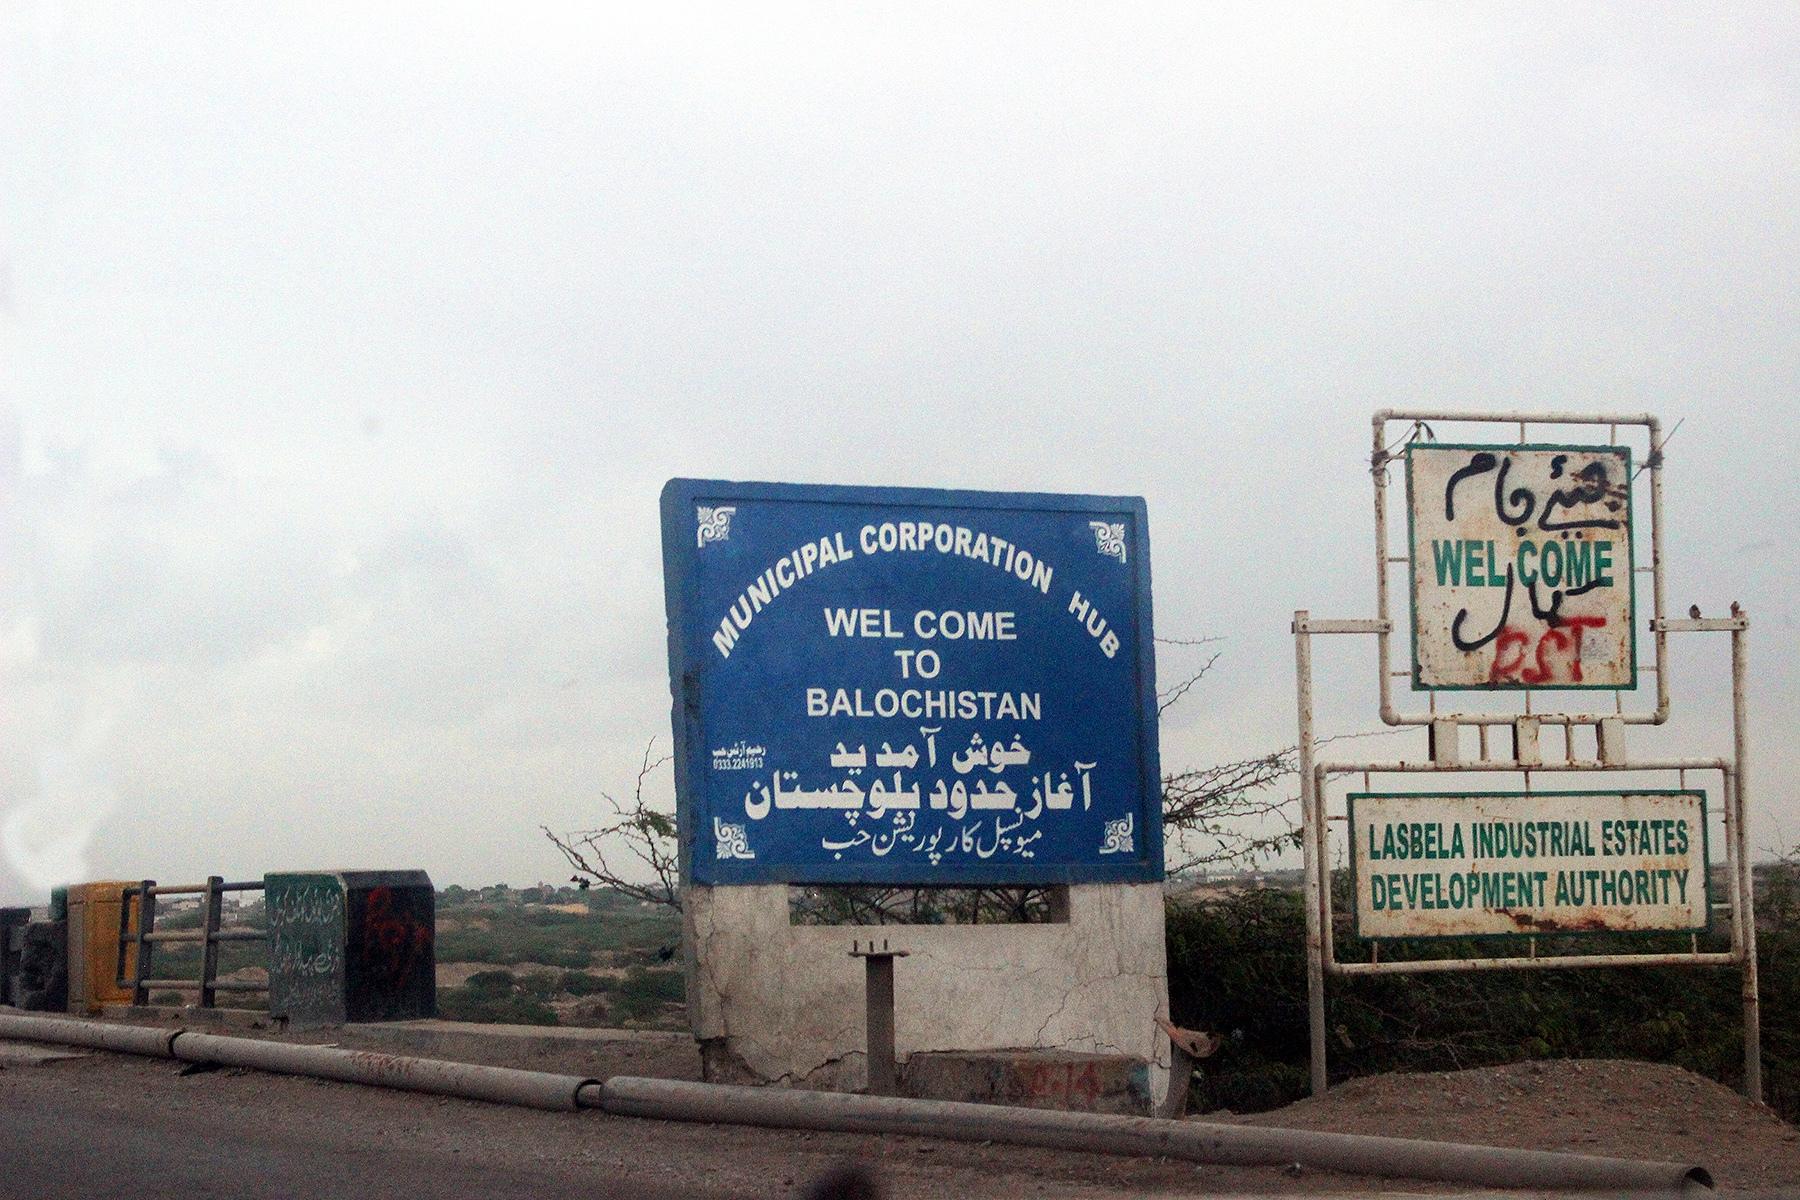 Entrance to Balochistan.